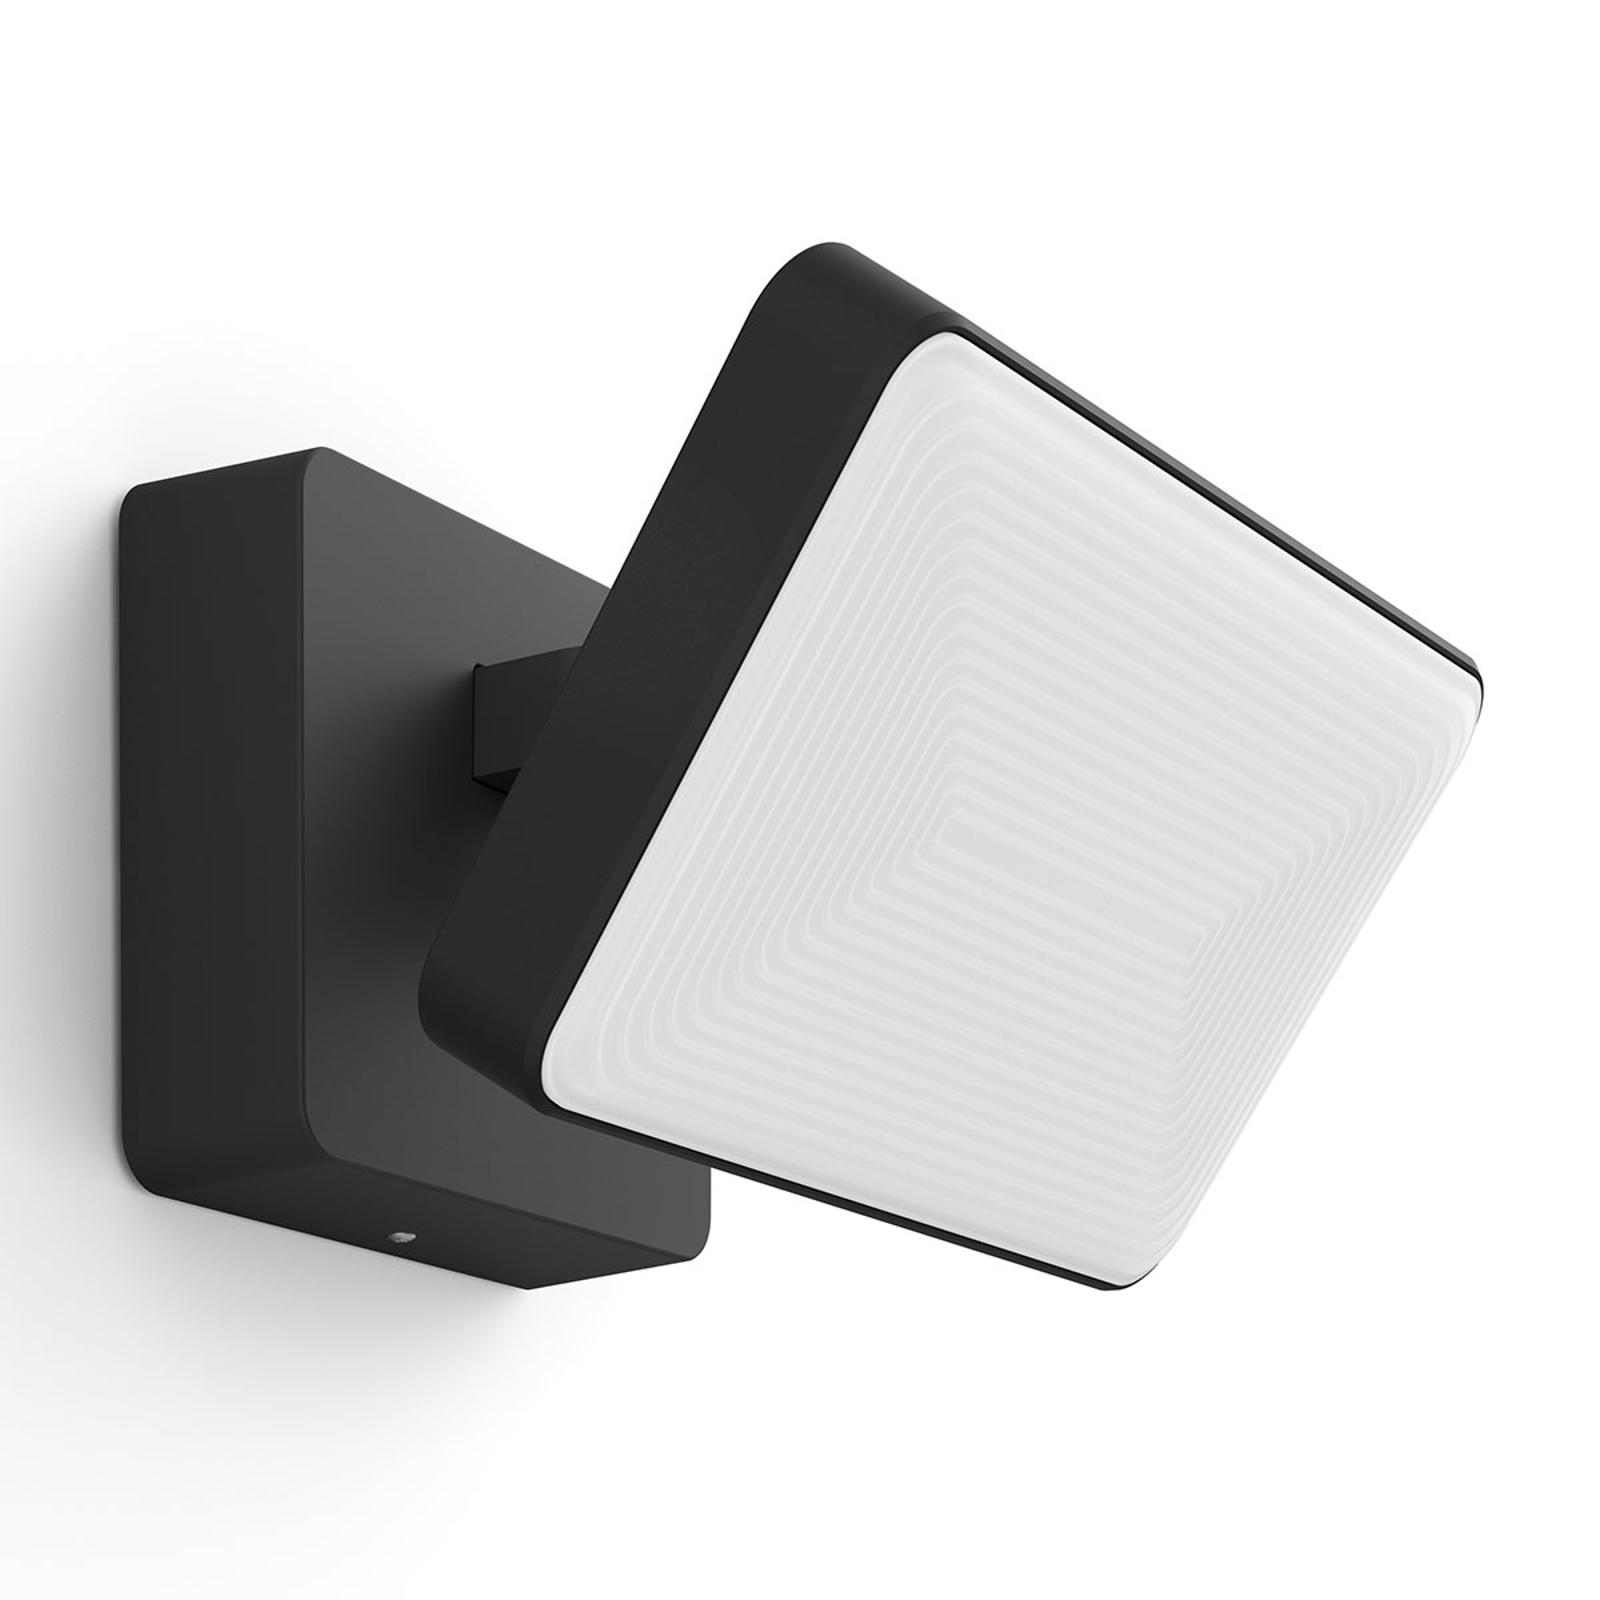 Philips Hue White+Color Discover LED-Außenstrahler